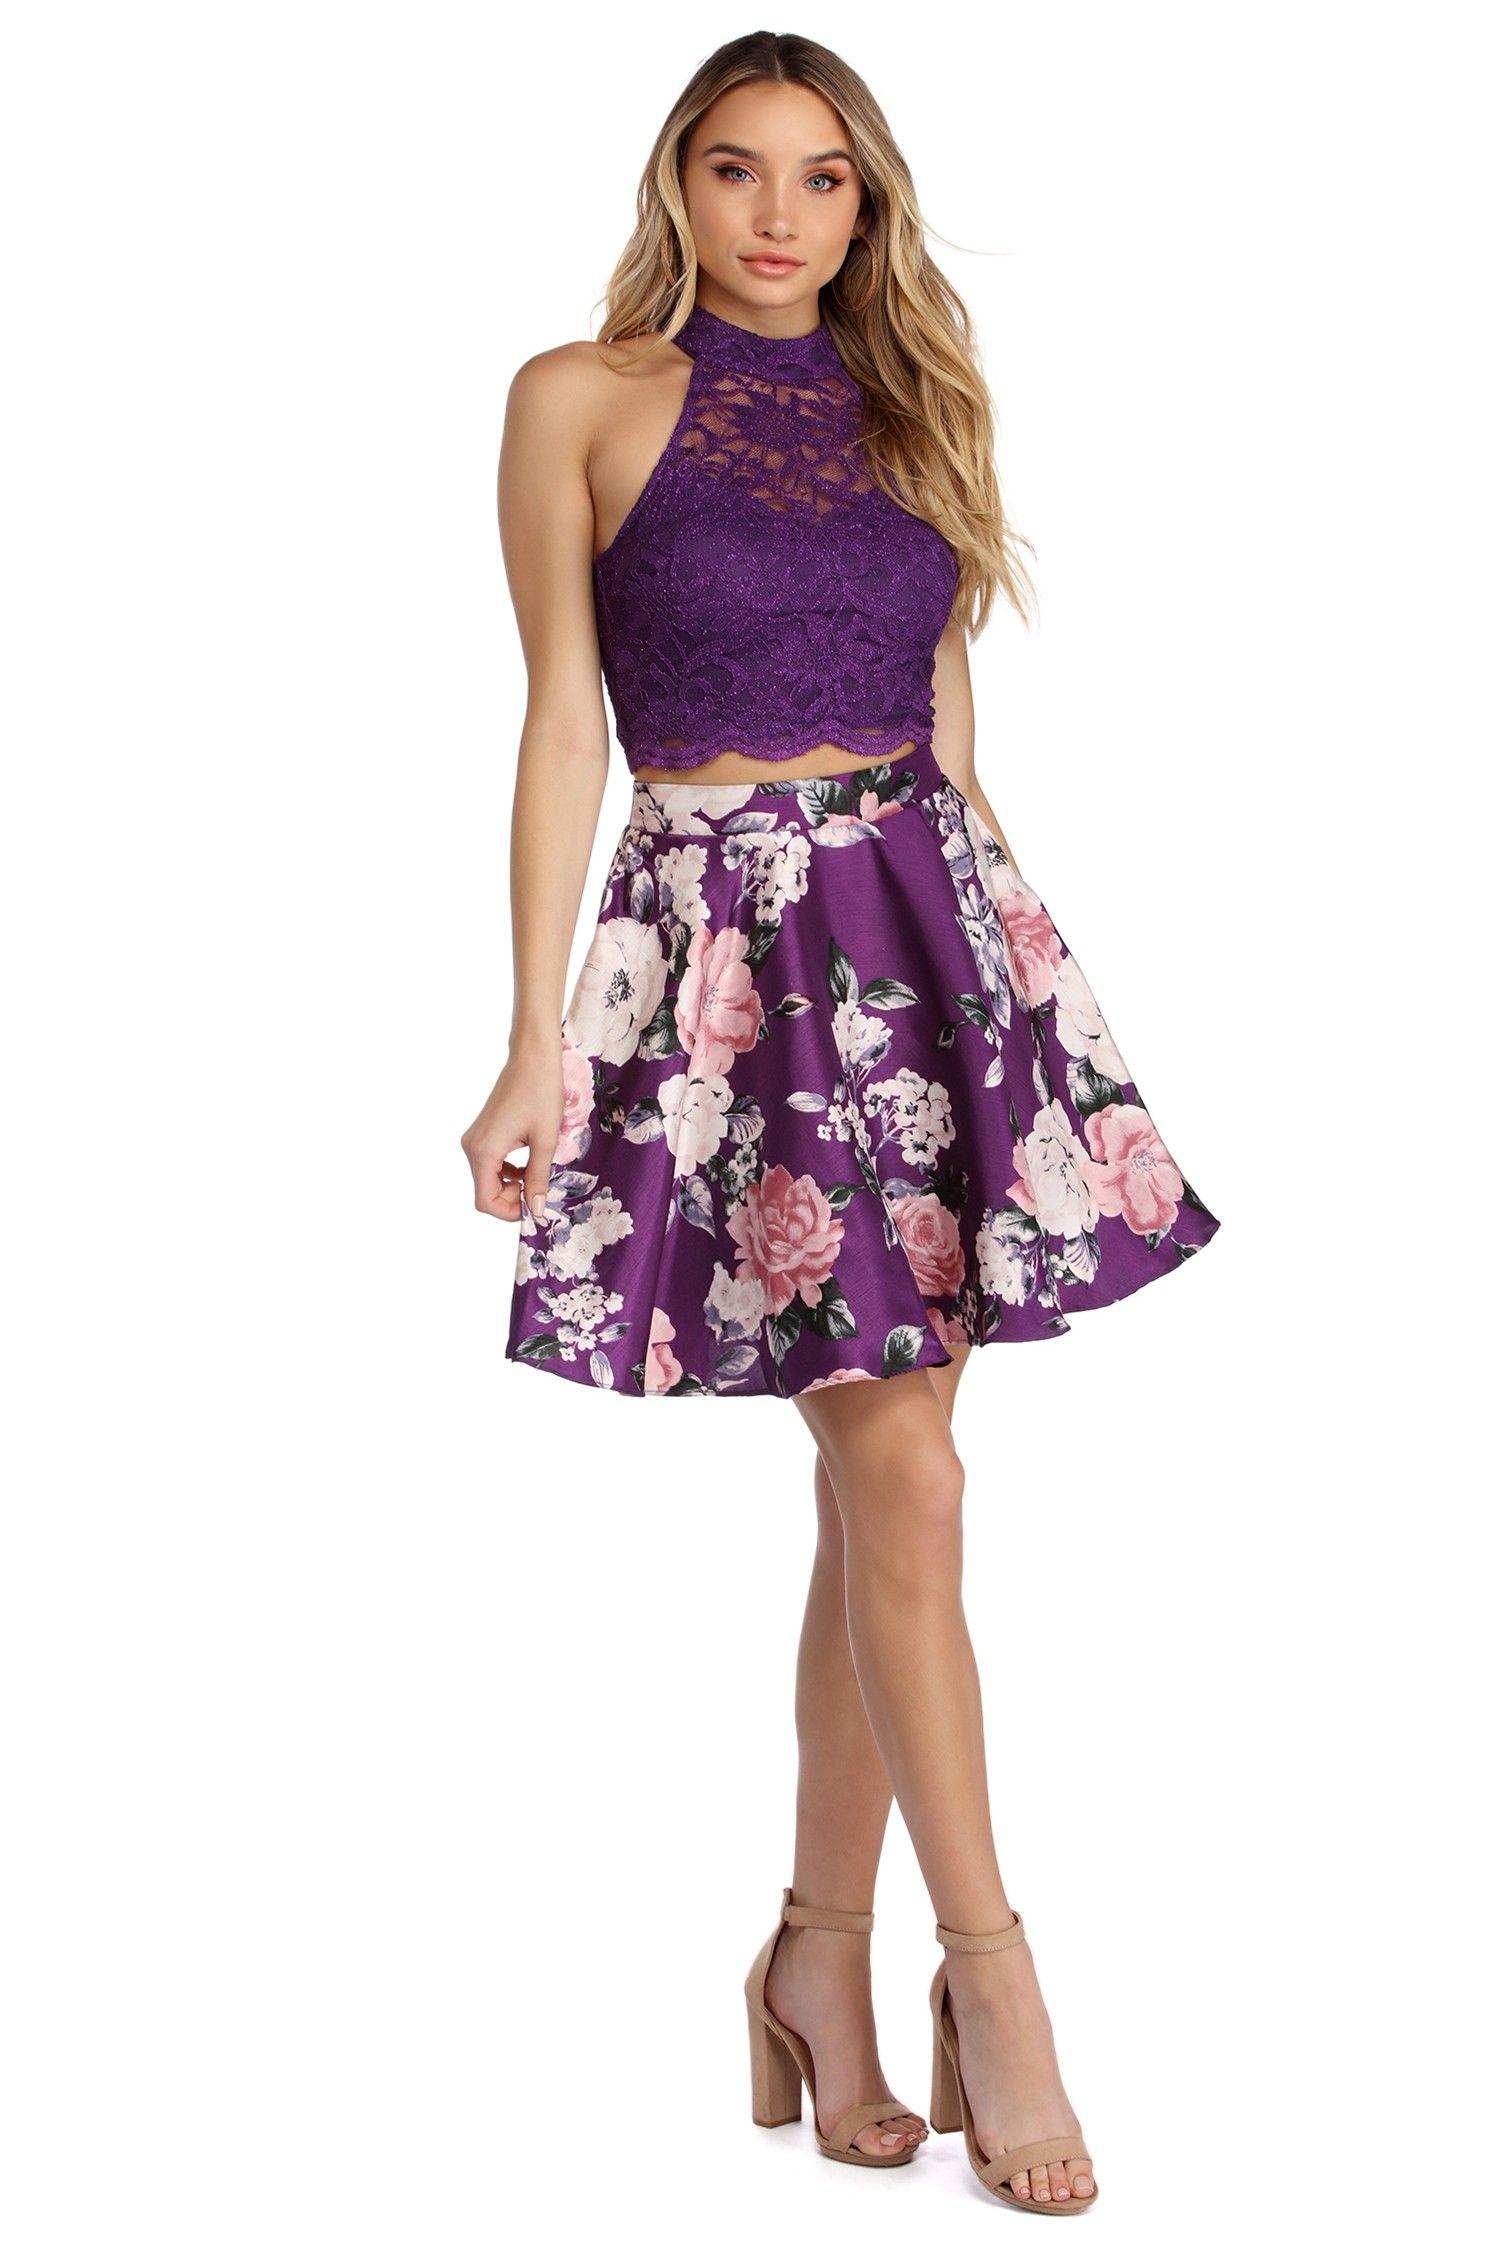 Zoey Purple Metallic Lace Two Piece Dress Two Piece Dress Purple Dresses Formal Piece Dress [ 2247 x 1500 Pixel ]